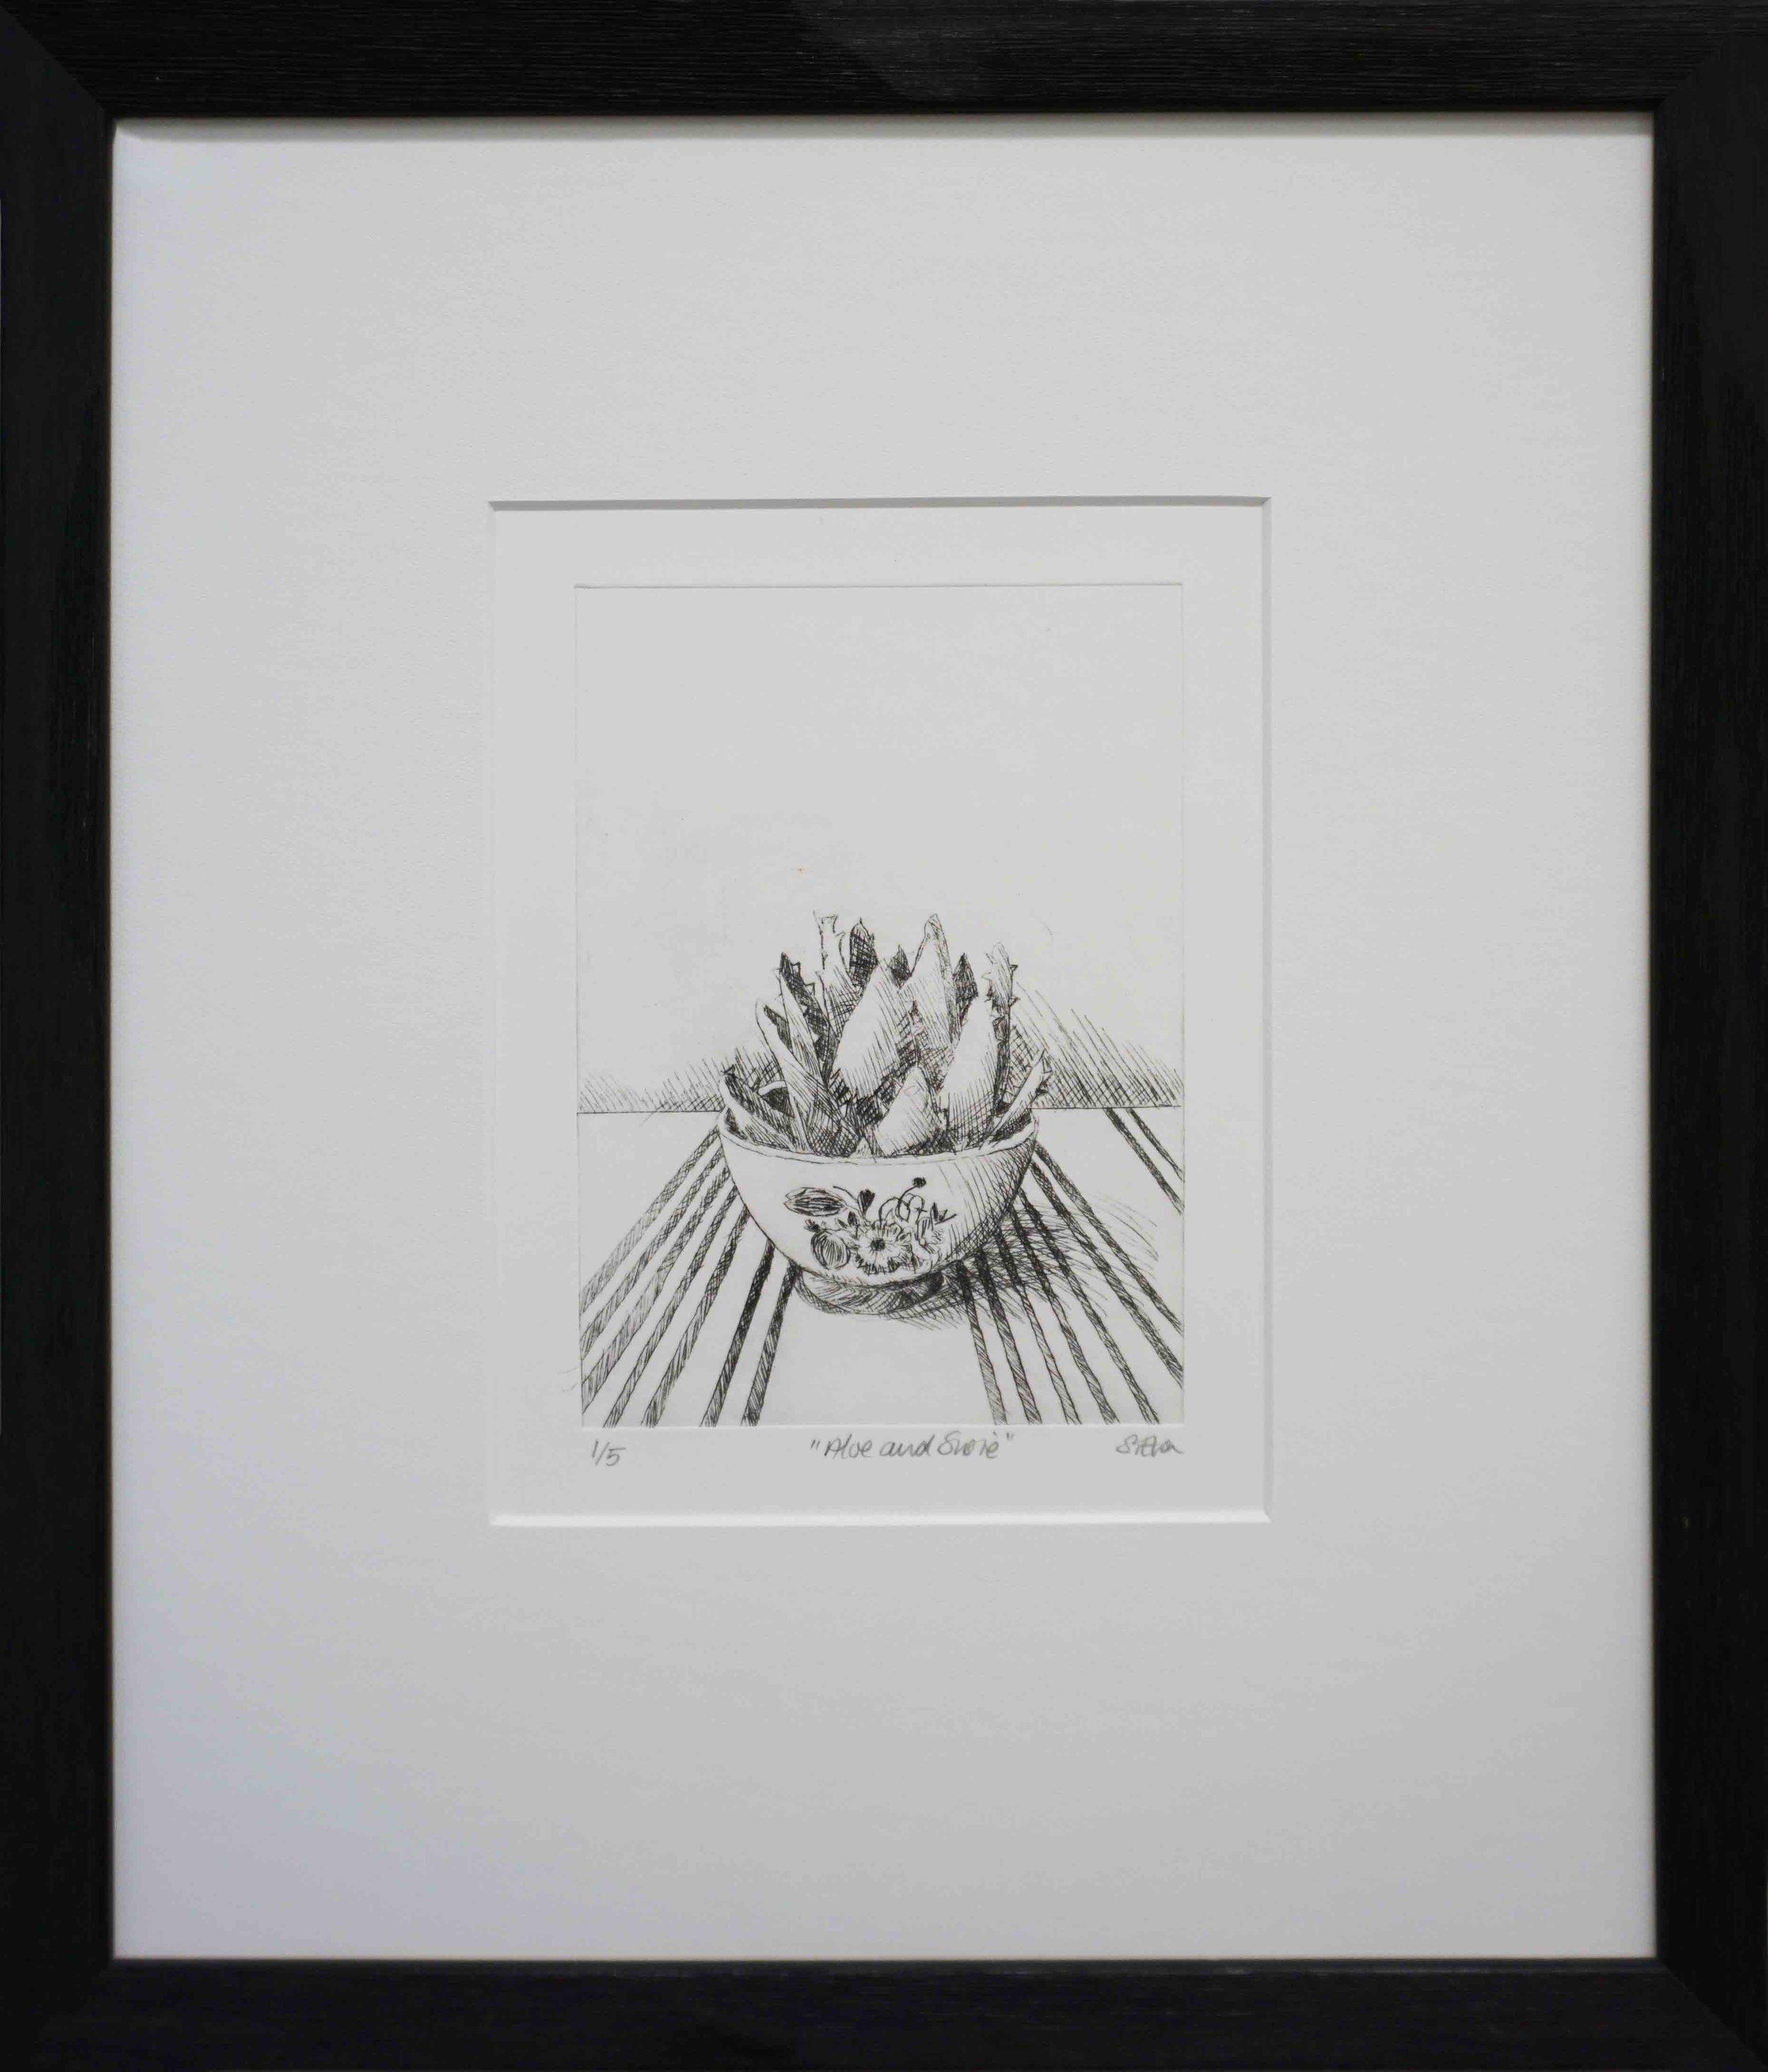 3. Sue Eva, 'Aloe and Susie', 2018, Drypoint etching, 15.5 x 11.5cm, $195